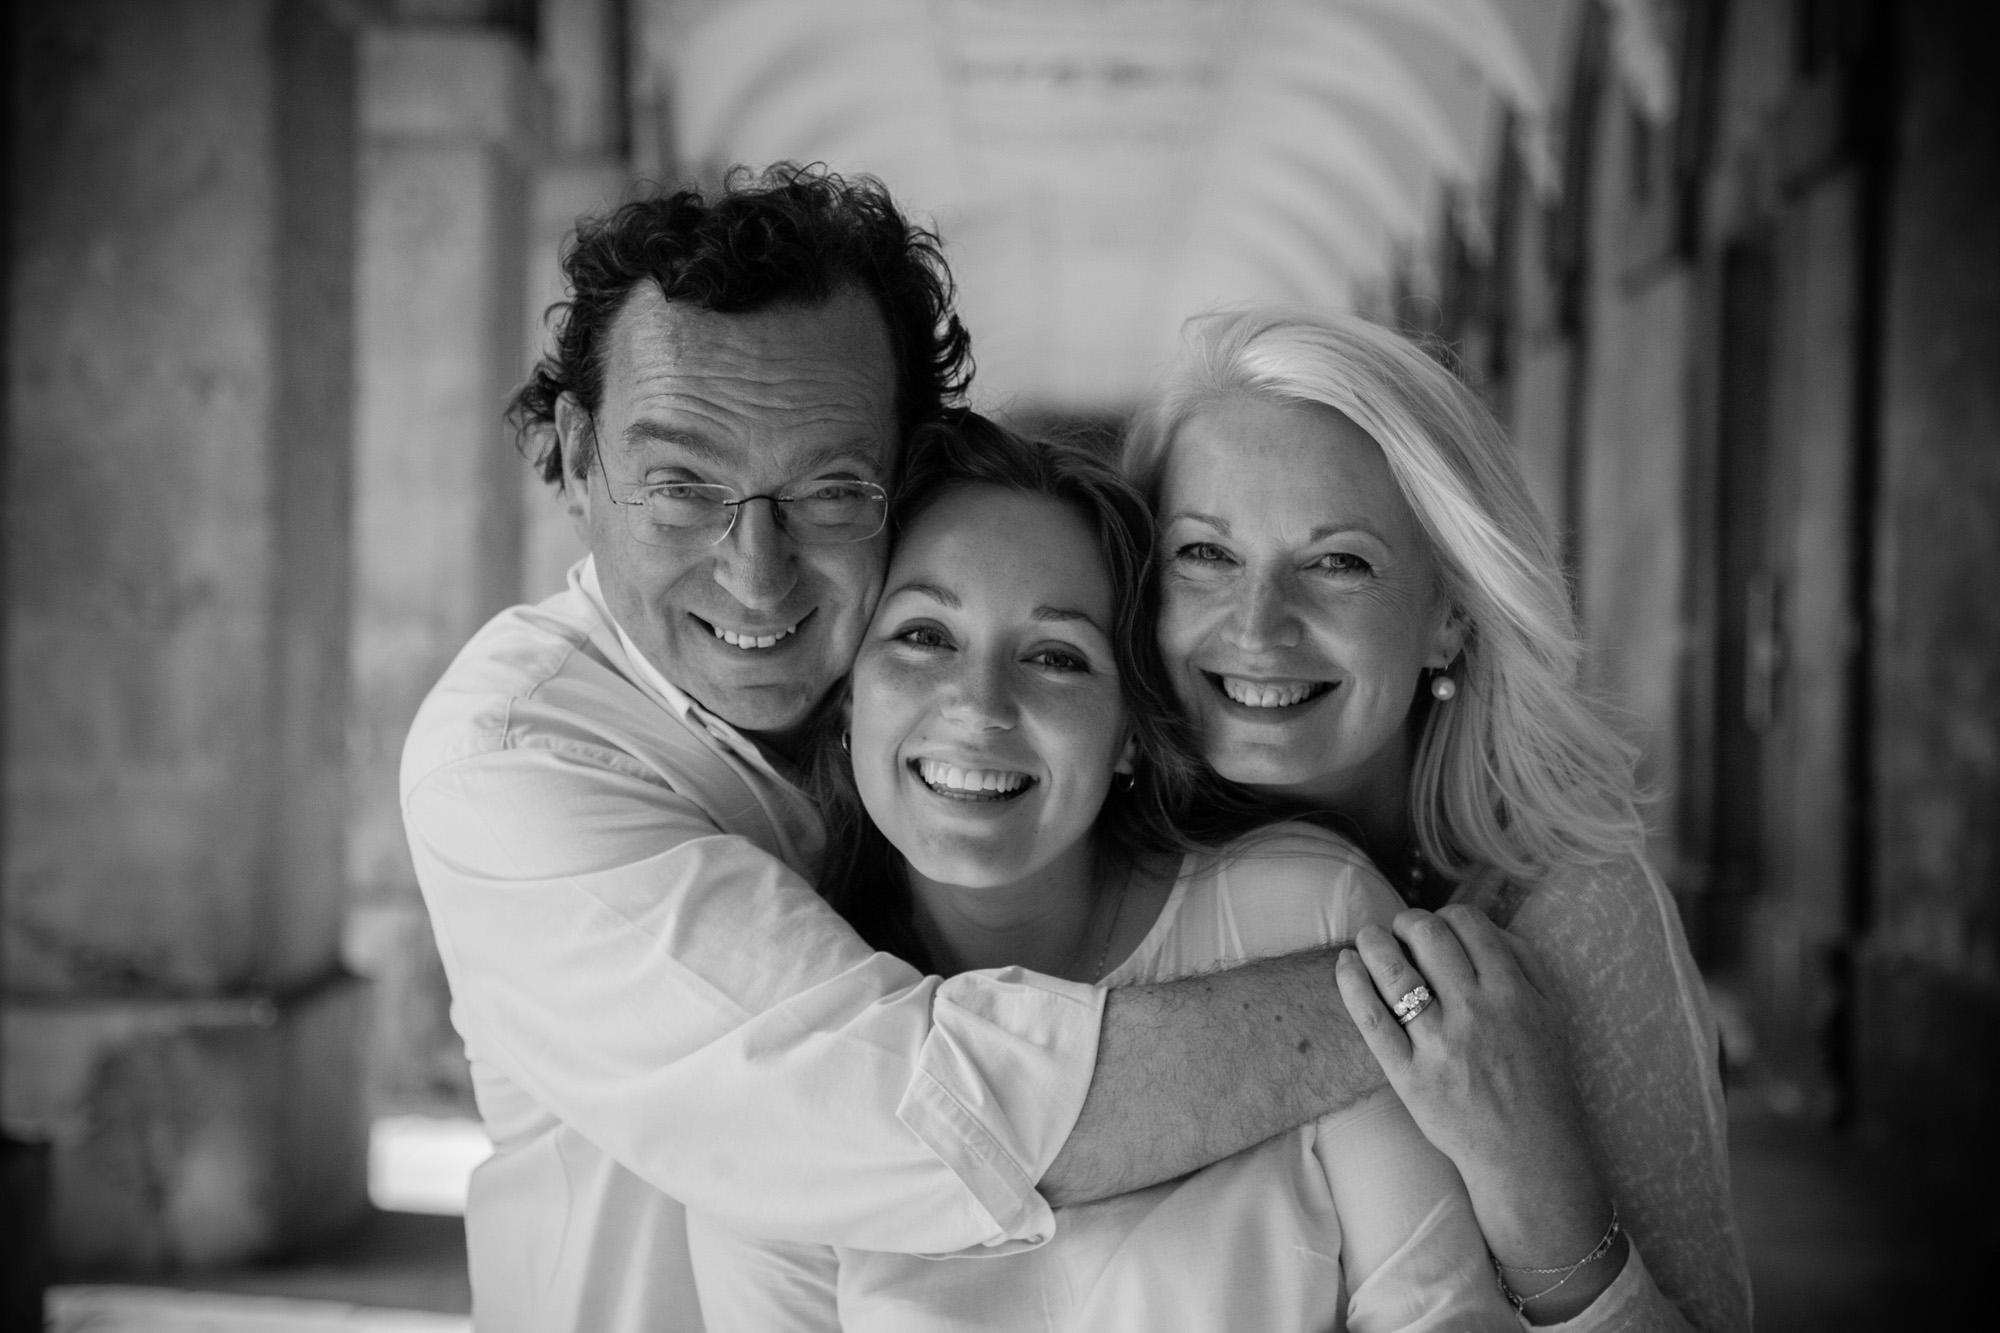 family-life-family-photographer-oxford-london-jonathan-self-photography-21.jpg